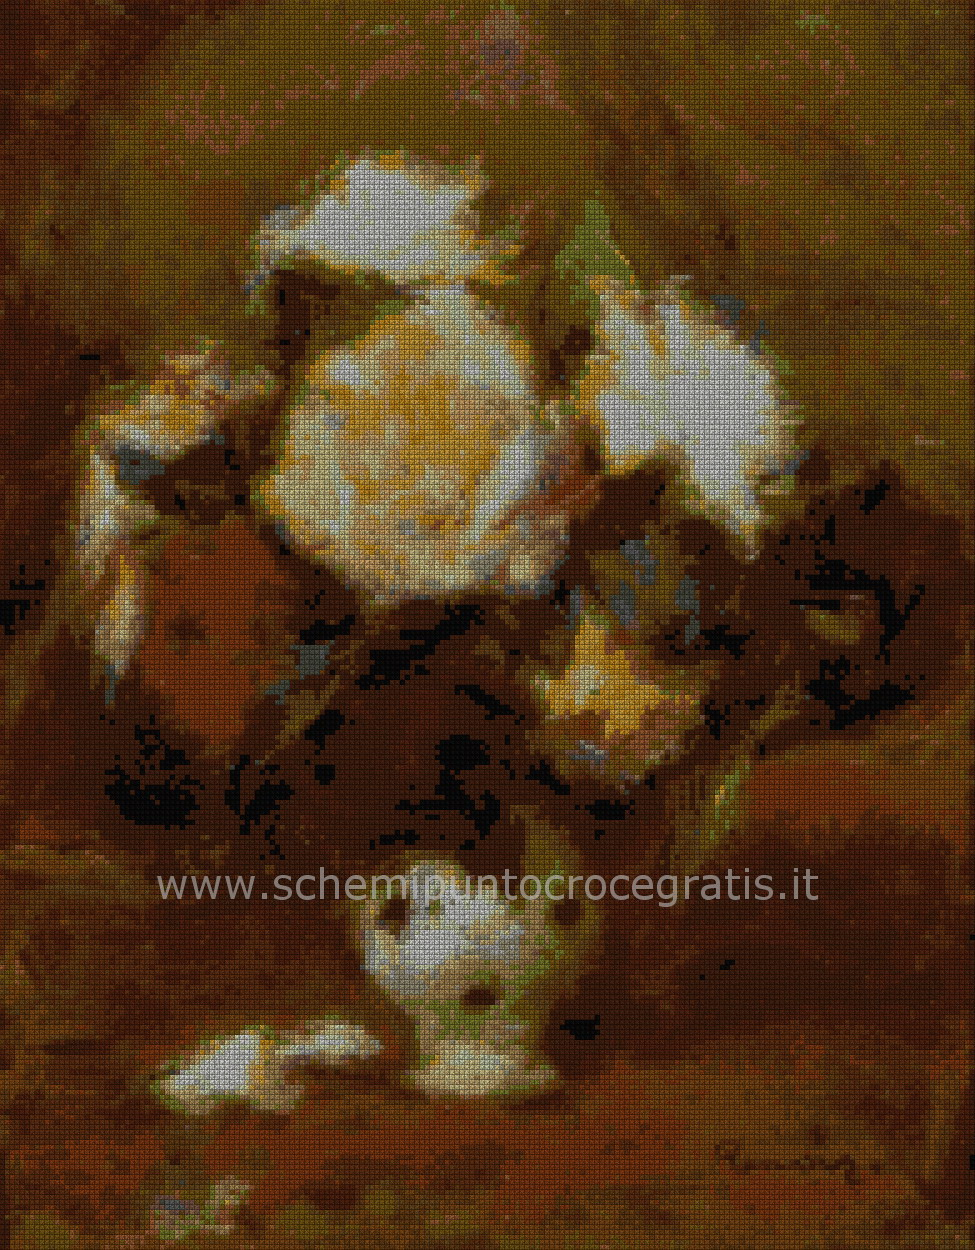 pittori_moderni/renoir/Renoir11.jpg